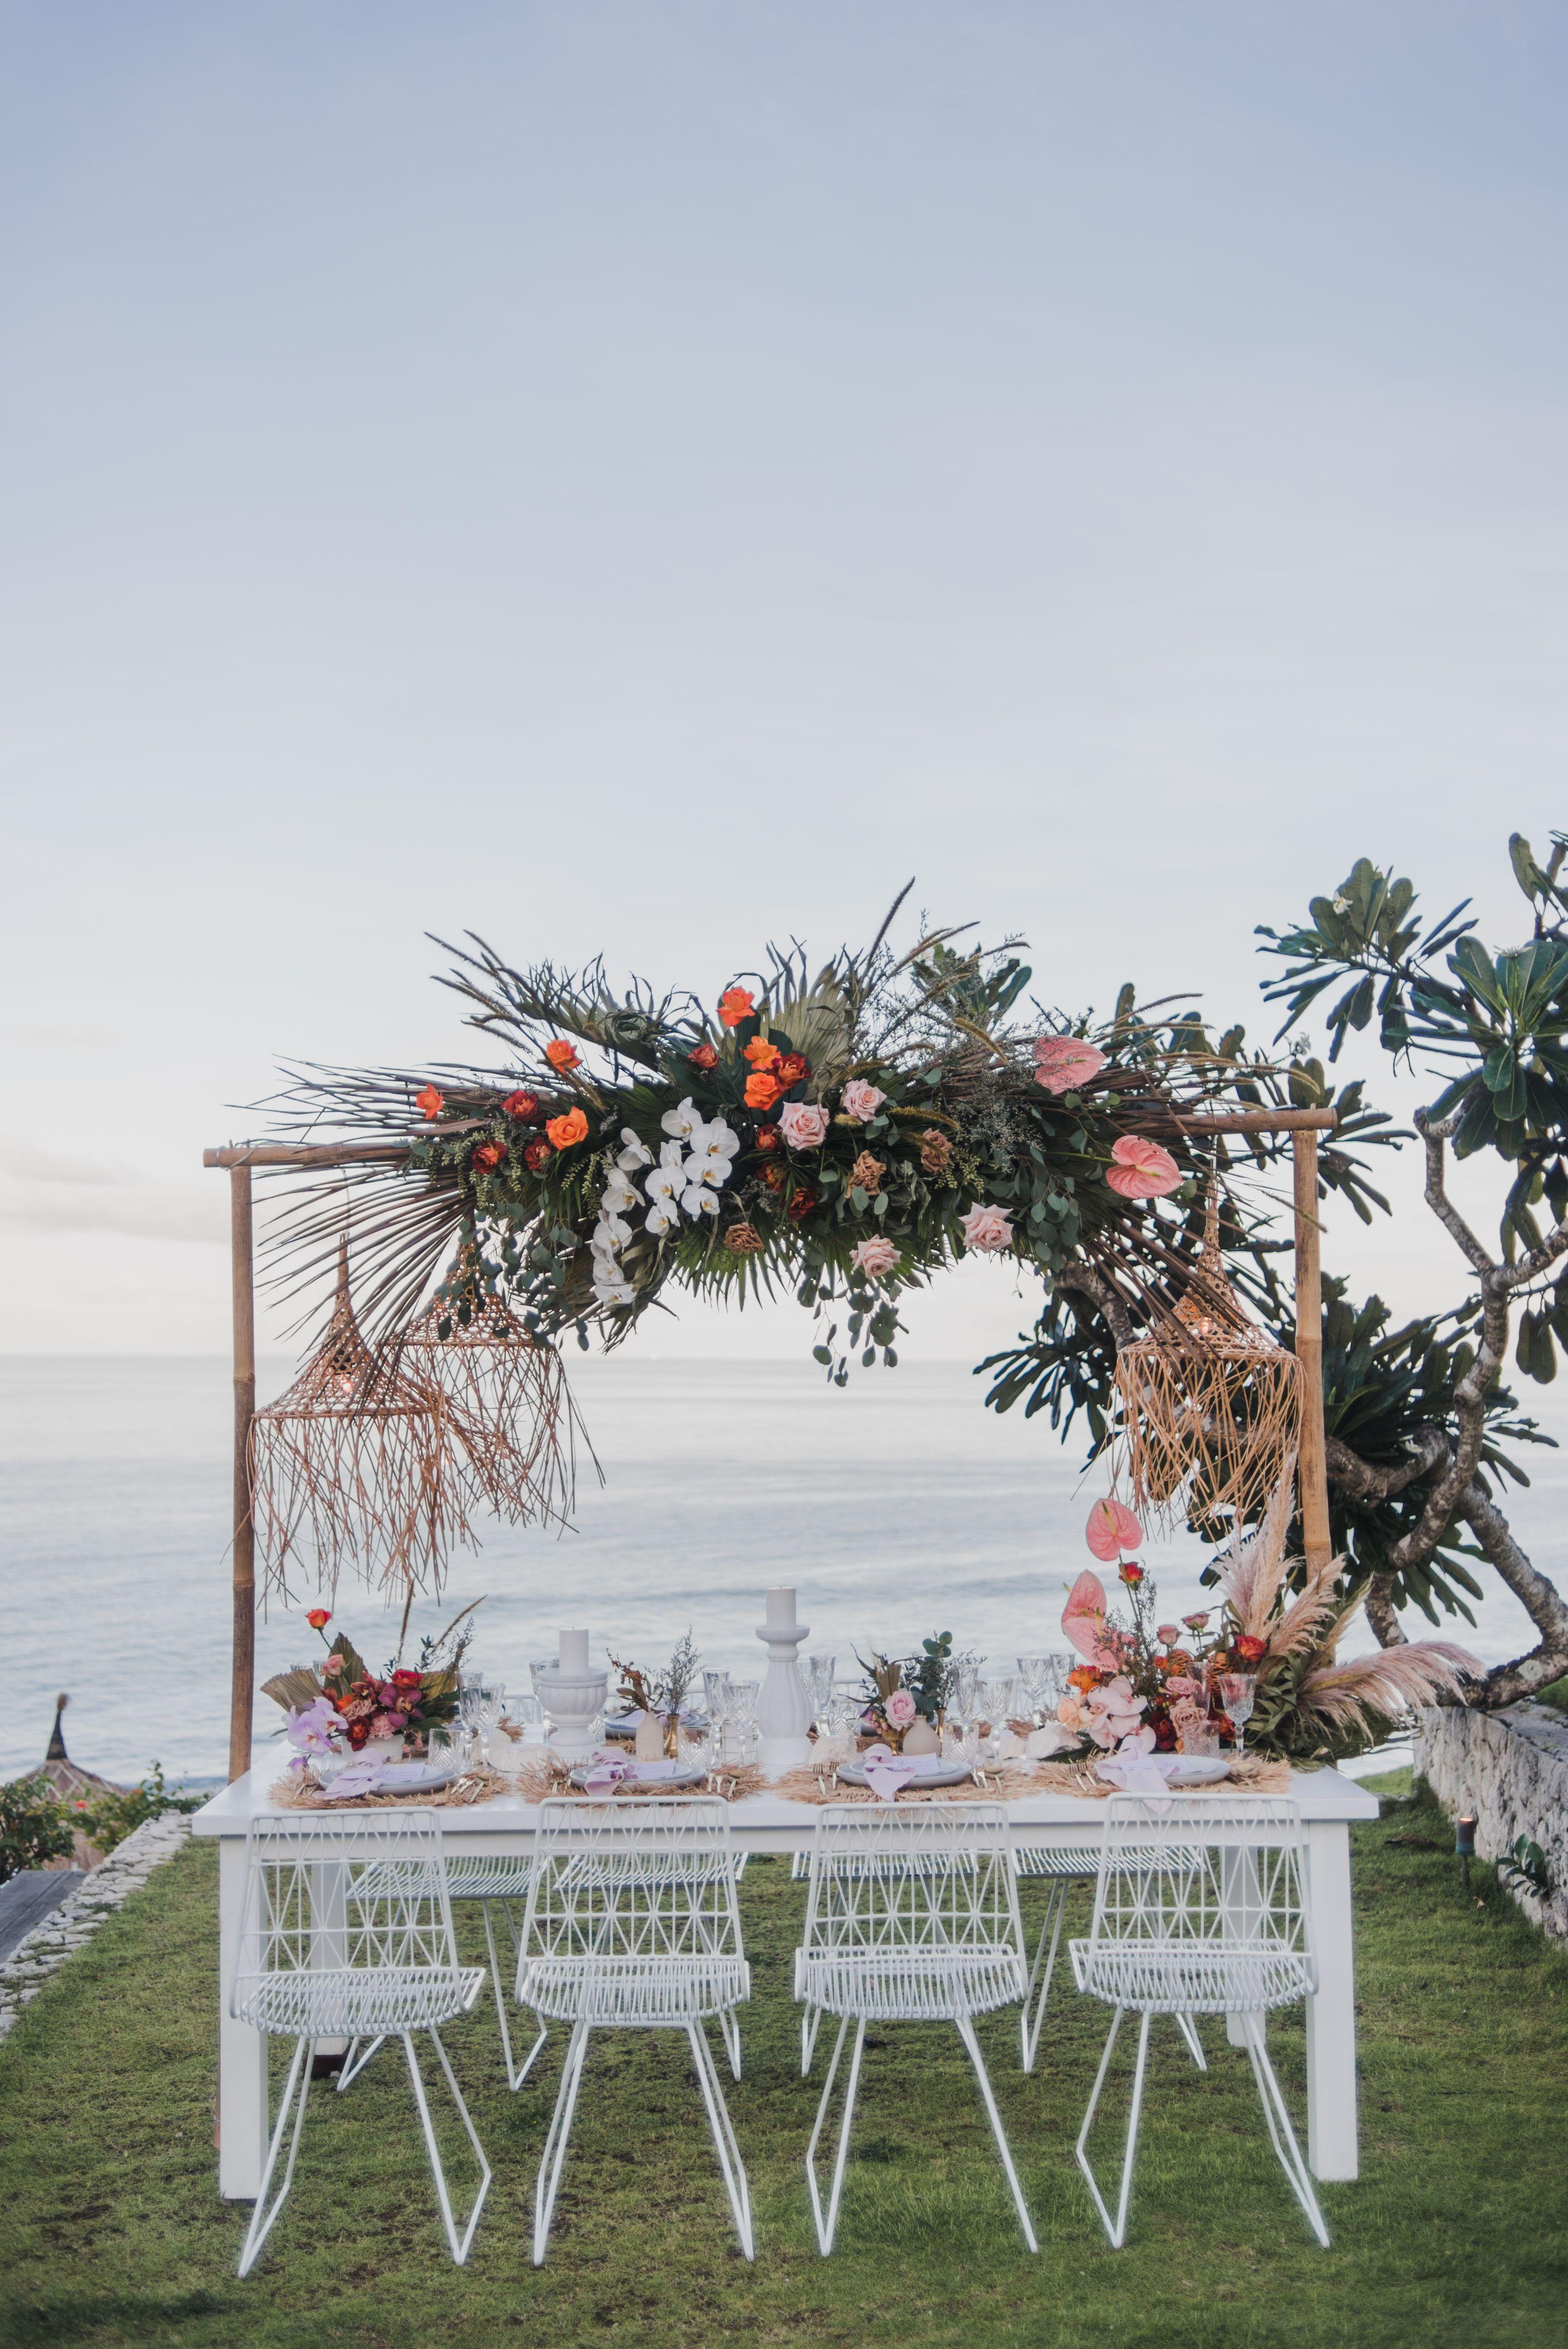 Bali Event Hire Wedding Furniture Rental Wedding Furniture Wedding Chairs